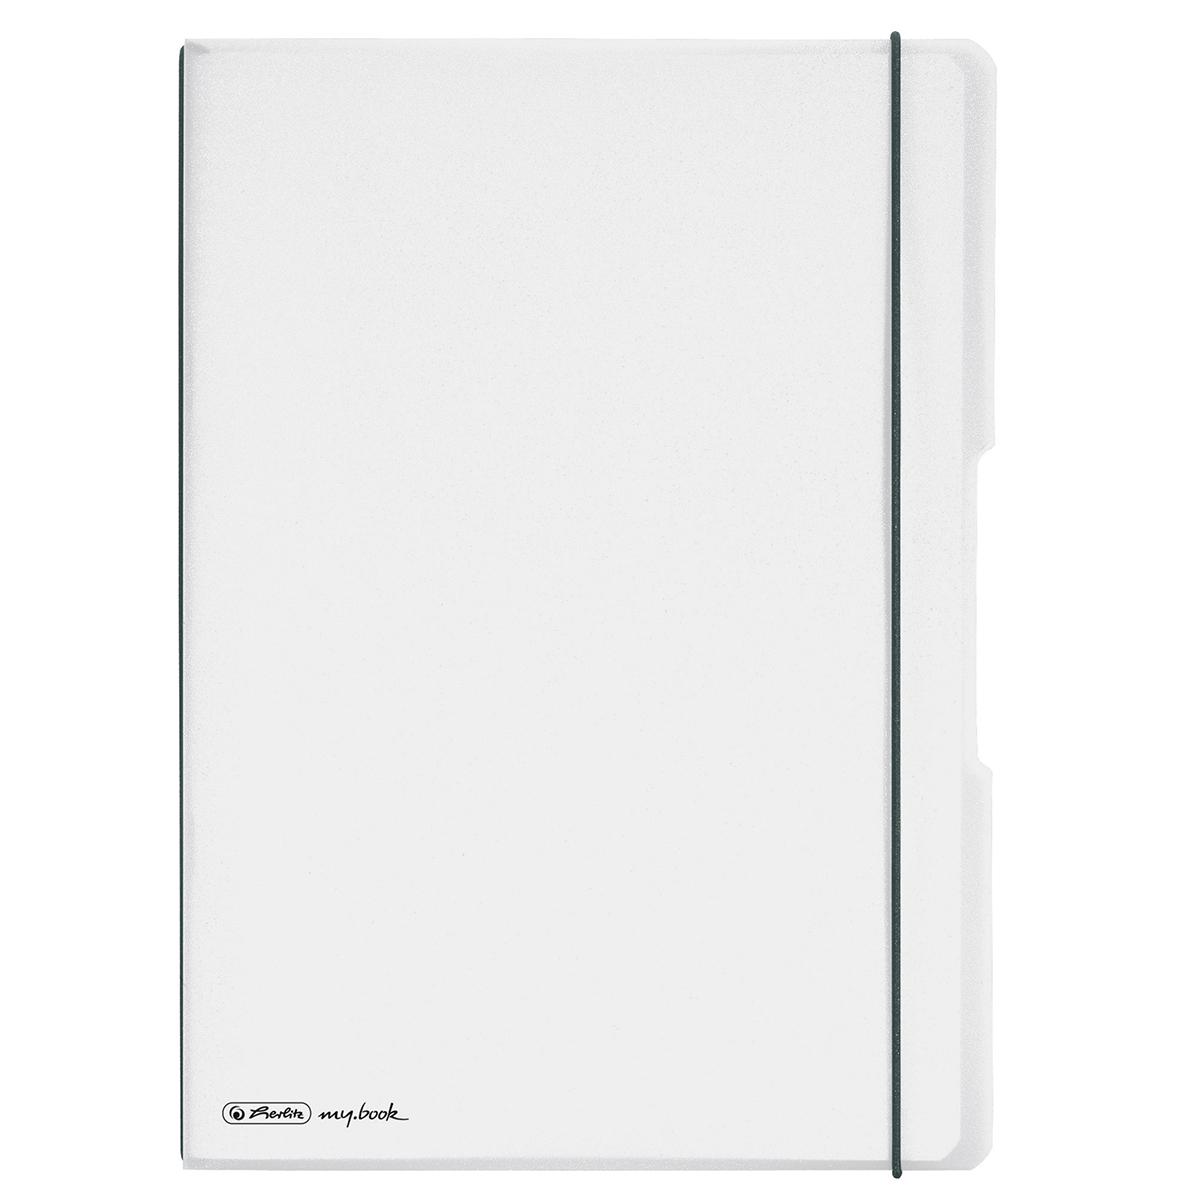 Caiet dictando + patratele Herlitz My Book Flex, A4, 2 x 40 file, coperta transparenta imagine 2021